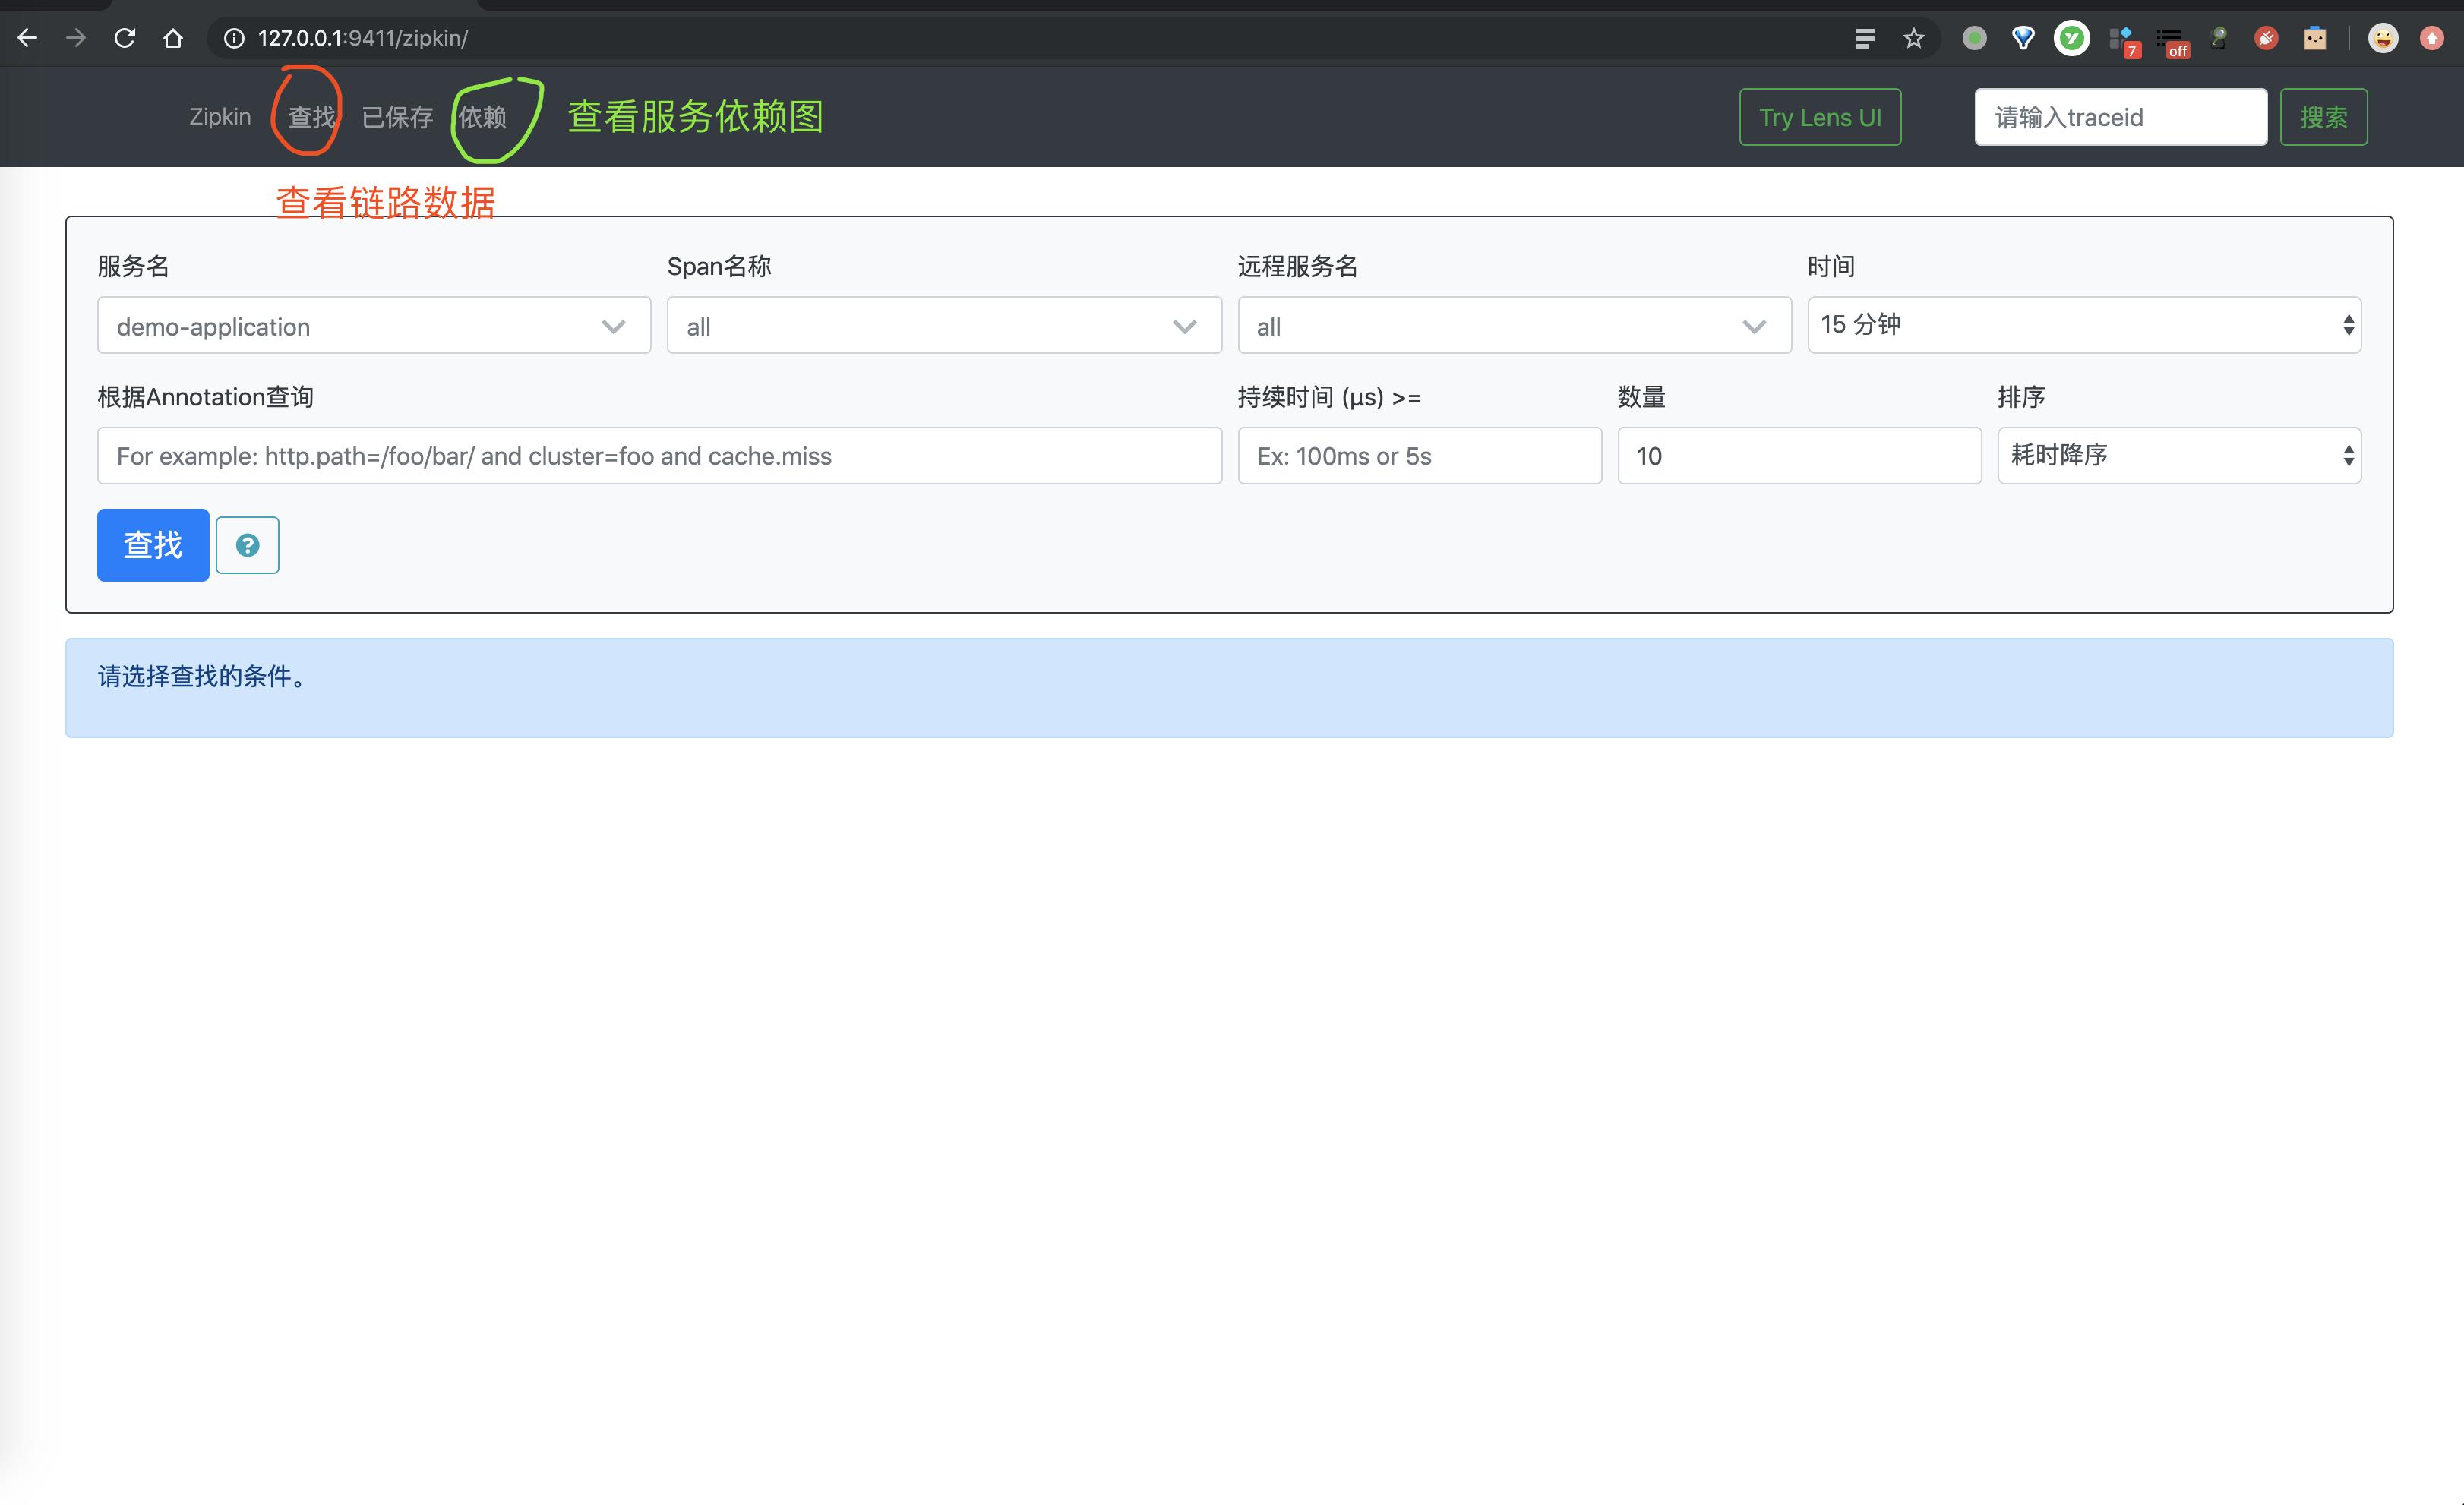 Zipkin UI 界面